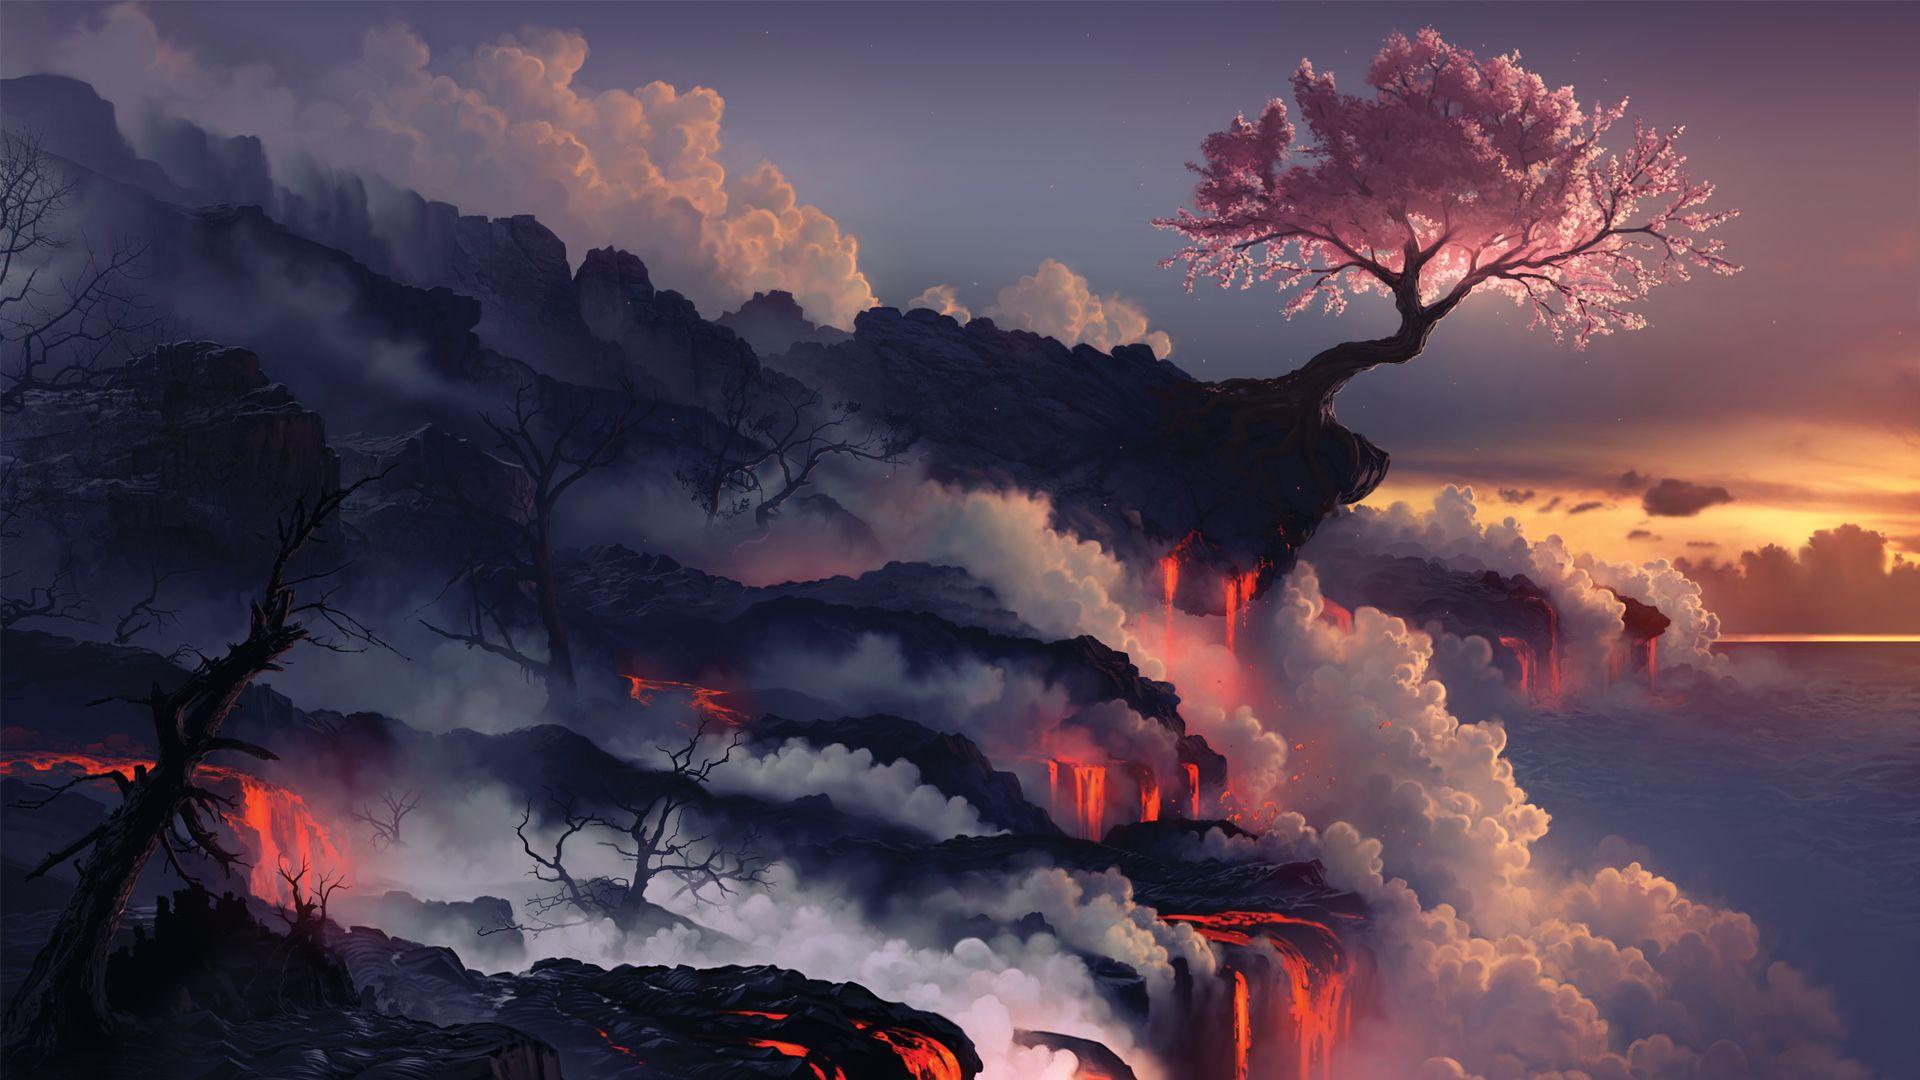 Sakura On The Edge Of The Volcano